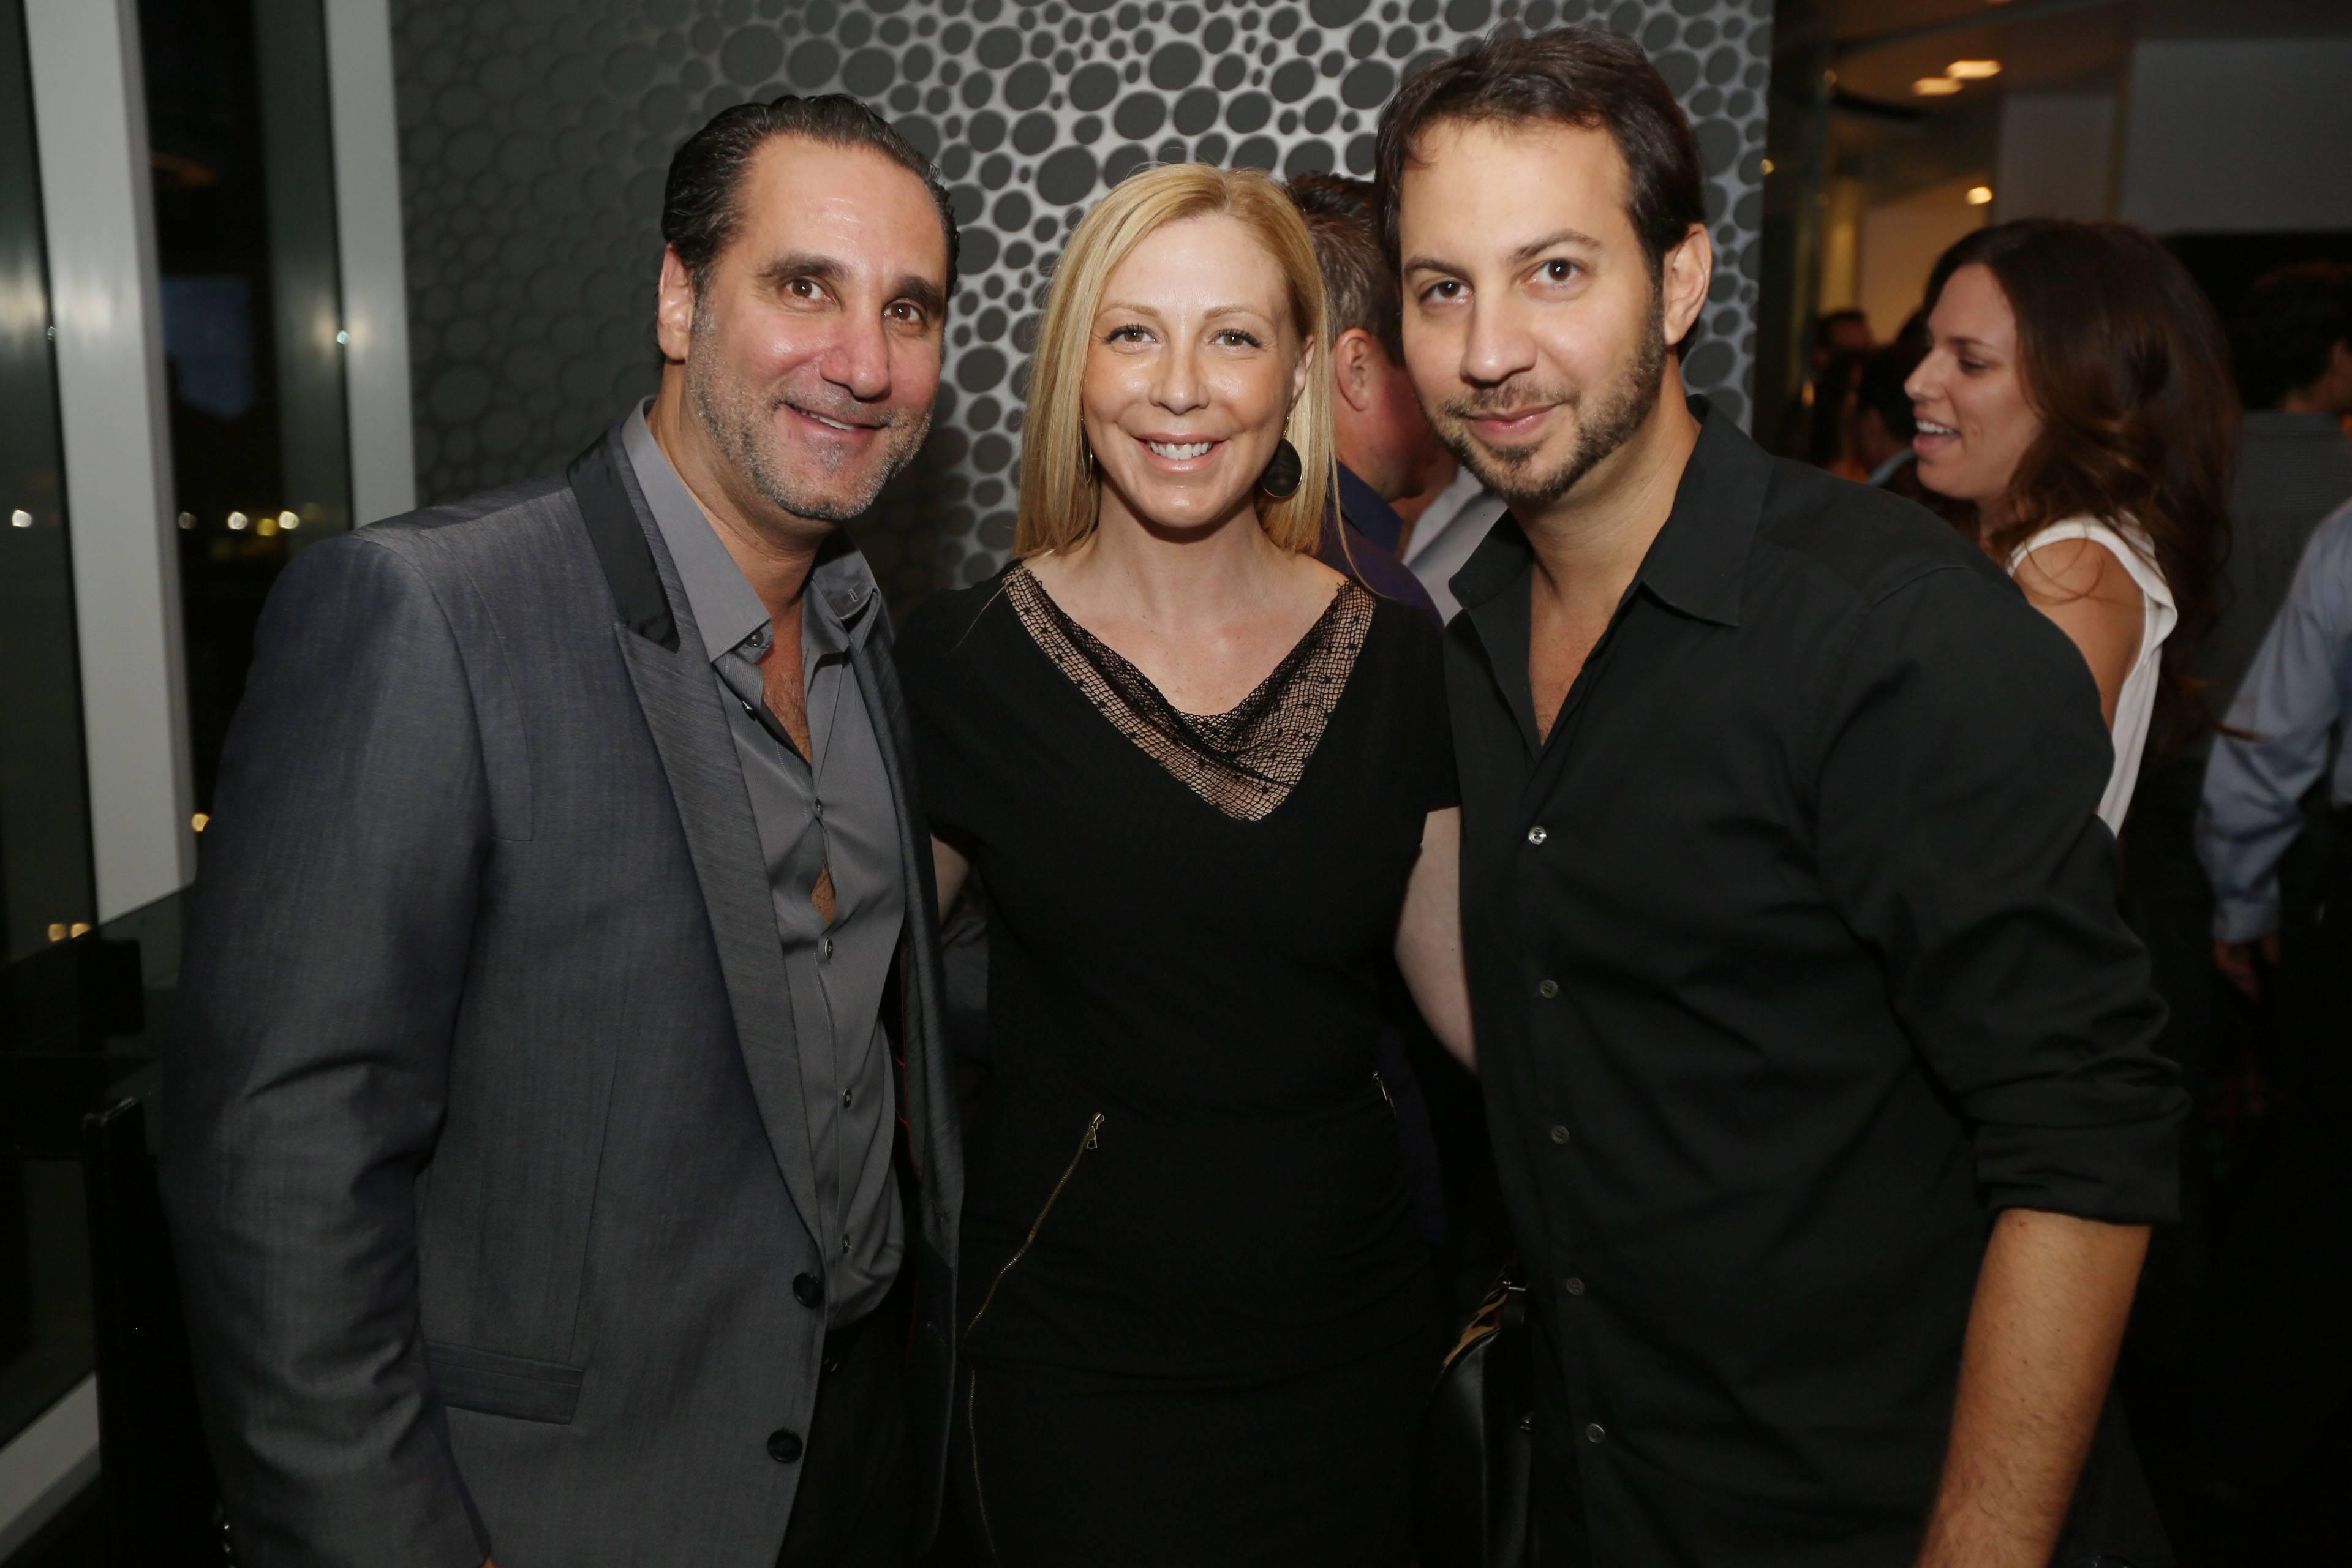 Louis & Angela Birdman, & Jared Shapiro1